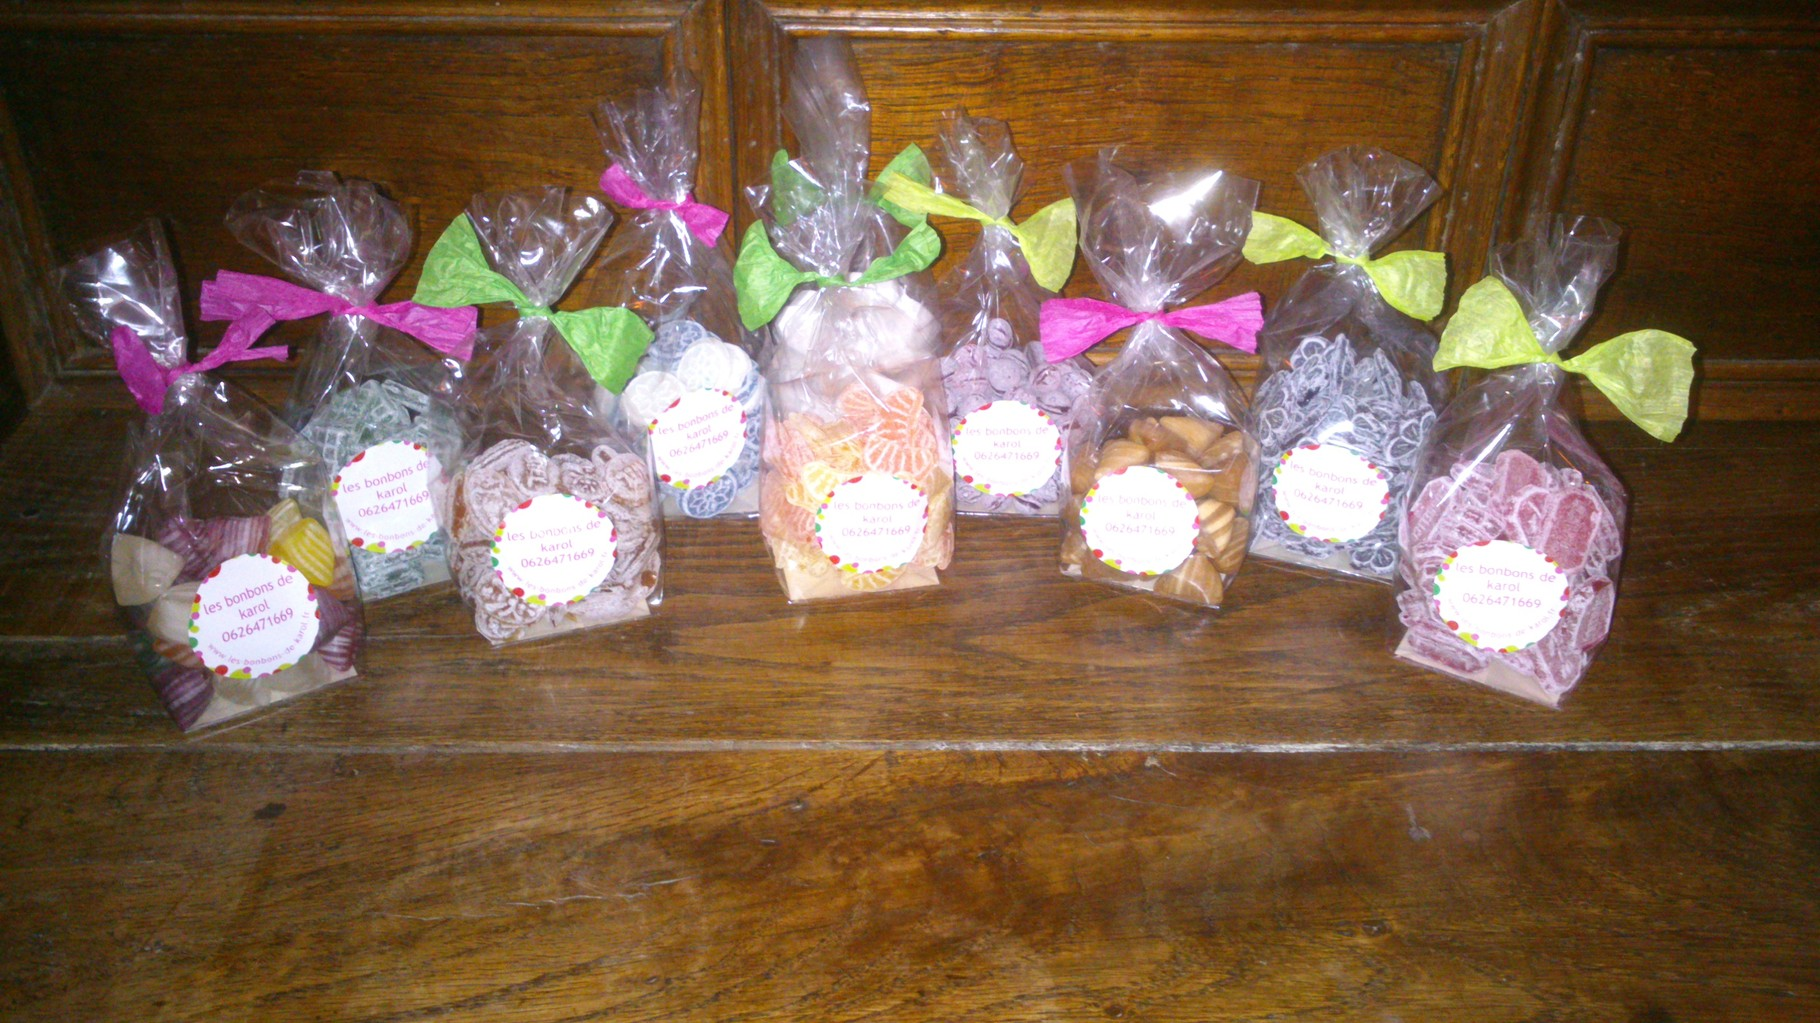 les bonbons d'antan aux arômes naturels (sachet de 100 gr) 3 €